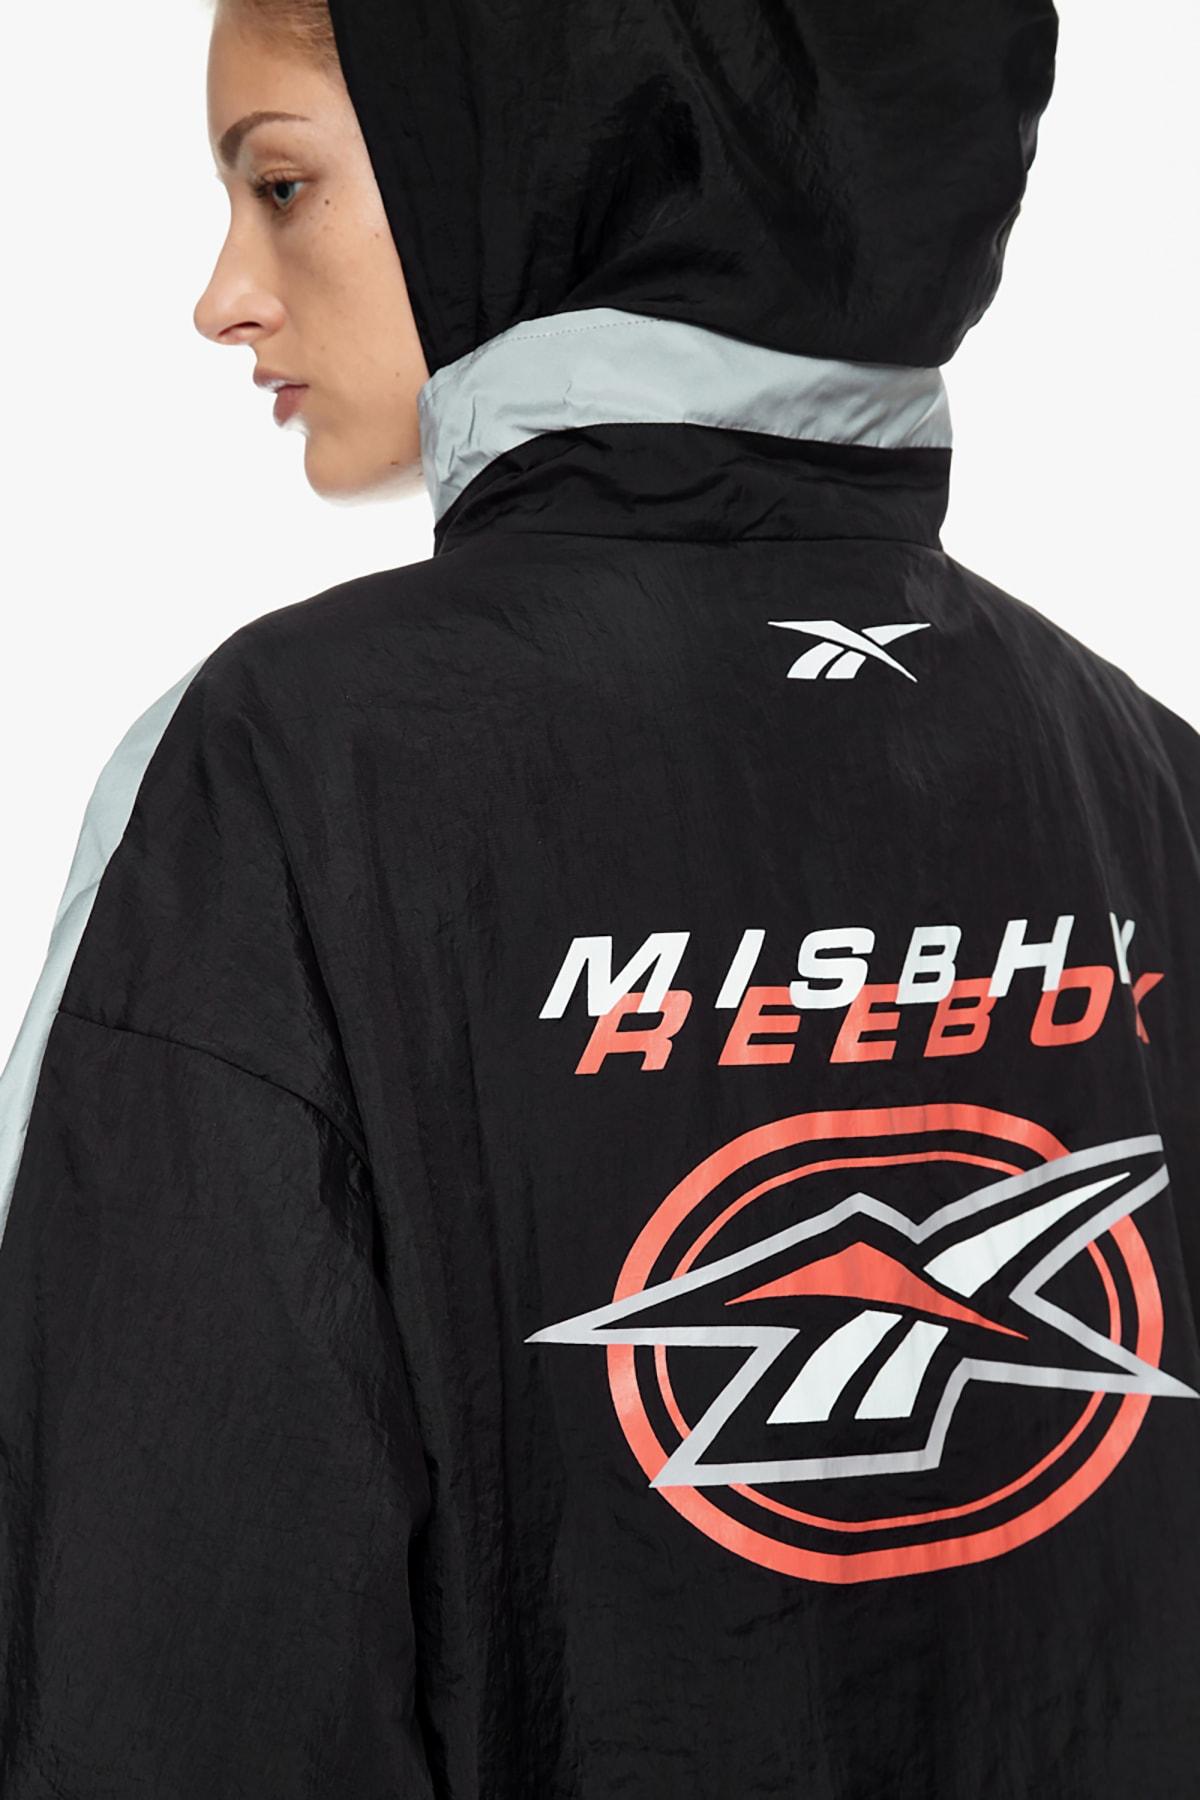 MISBHV x Reebok Collaboration Collection Bodysuit Silver